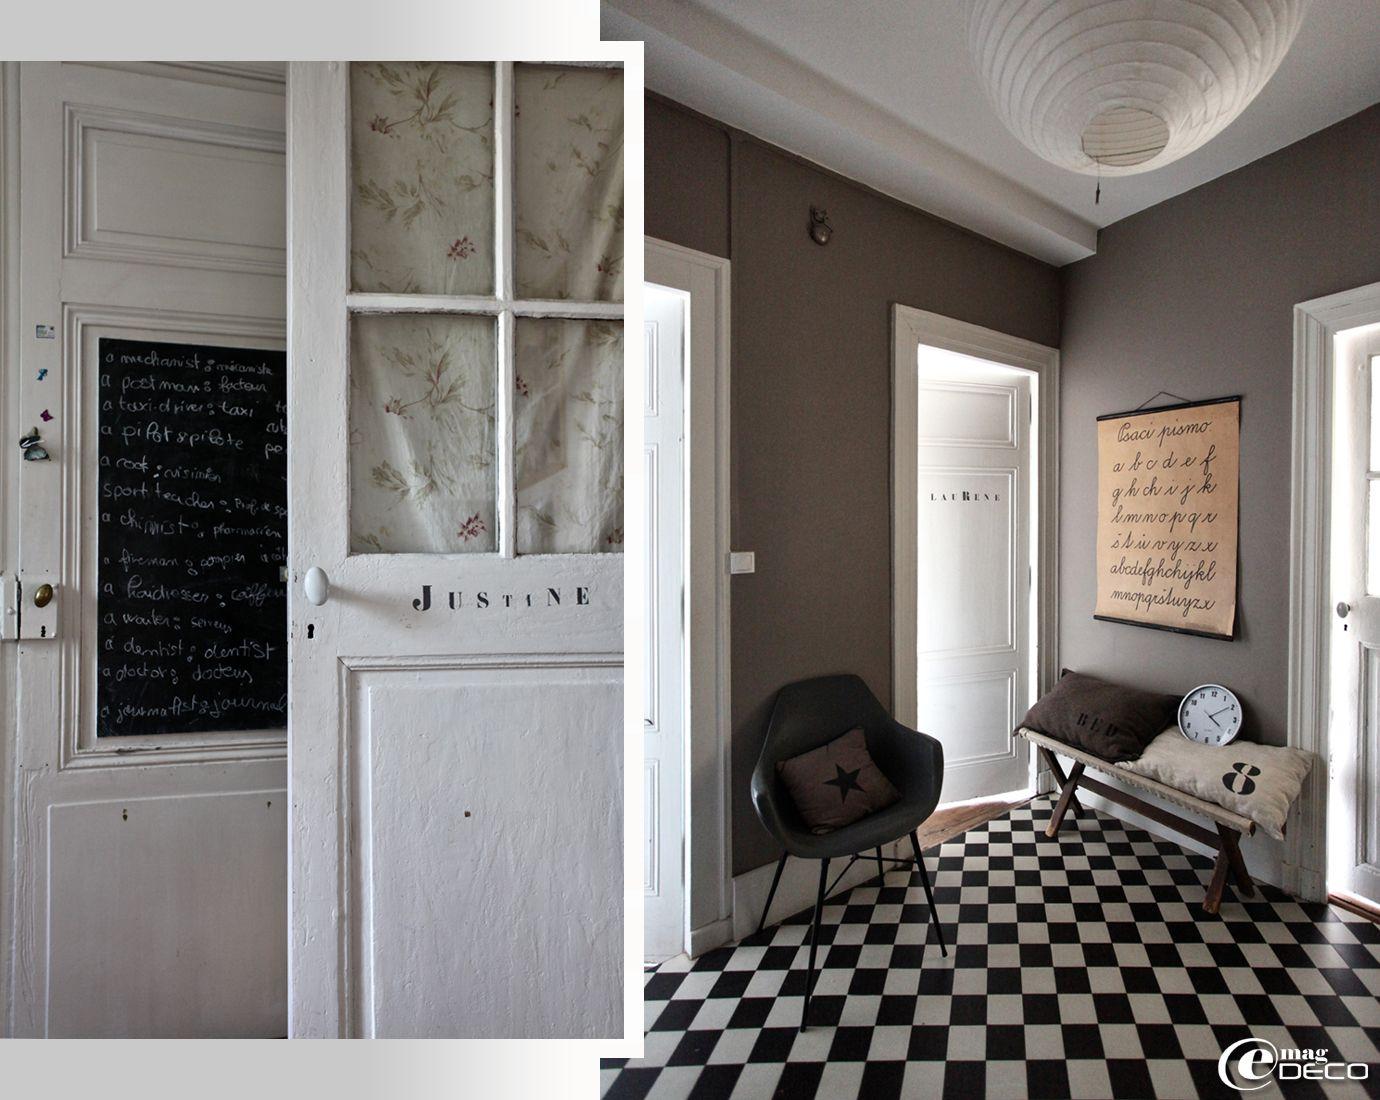 Beautiful Deco Porte Interieure Noire Images - Yourmentor.info ...